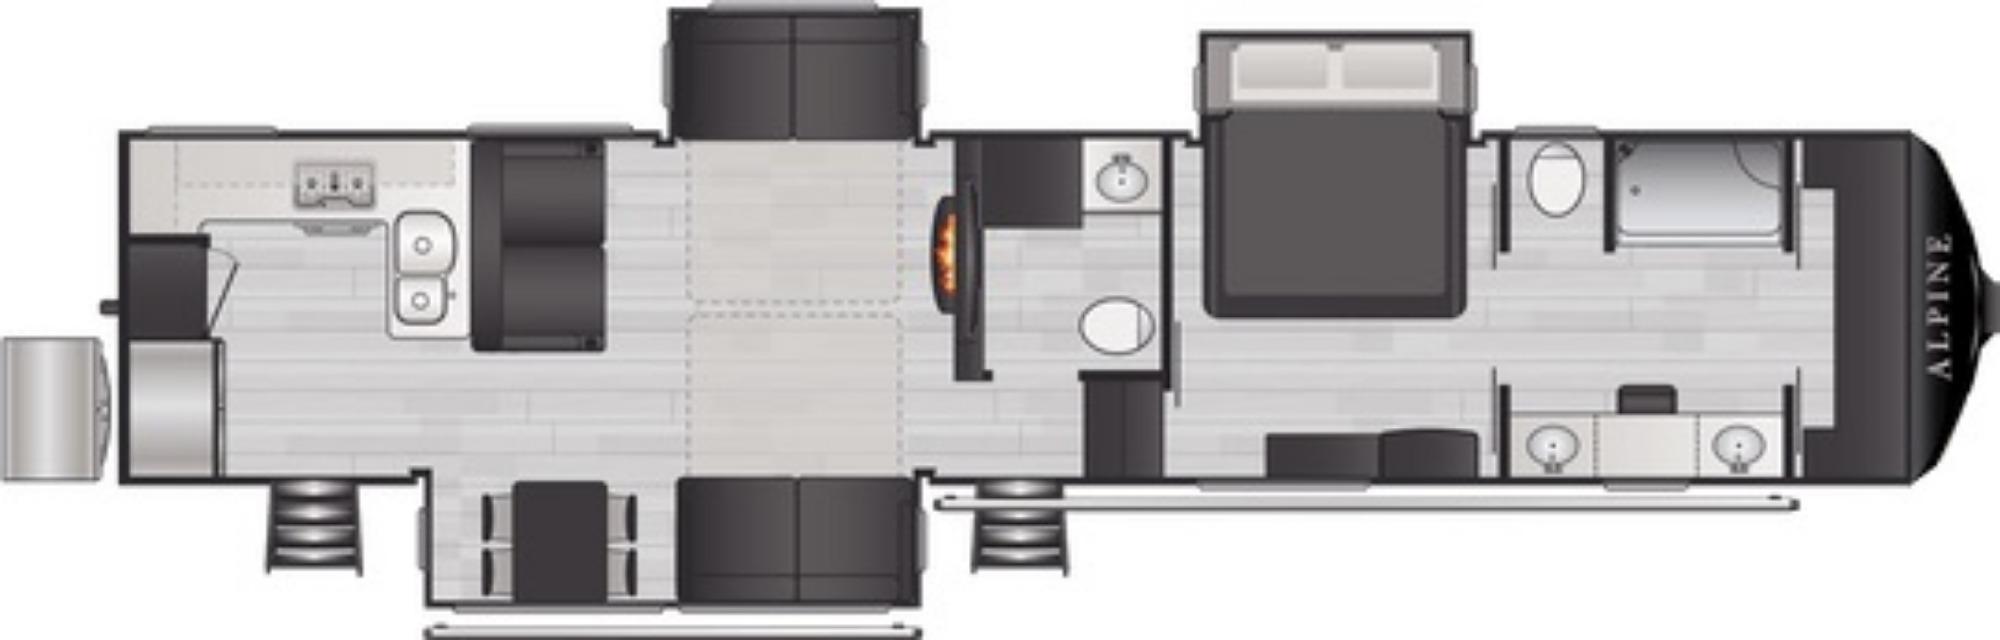 View Floor Plan for 2021 KEYSTONE ALPINE 3910RK